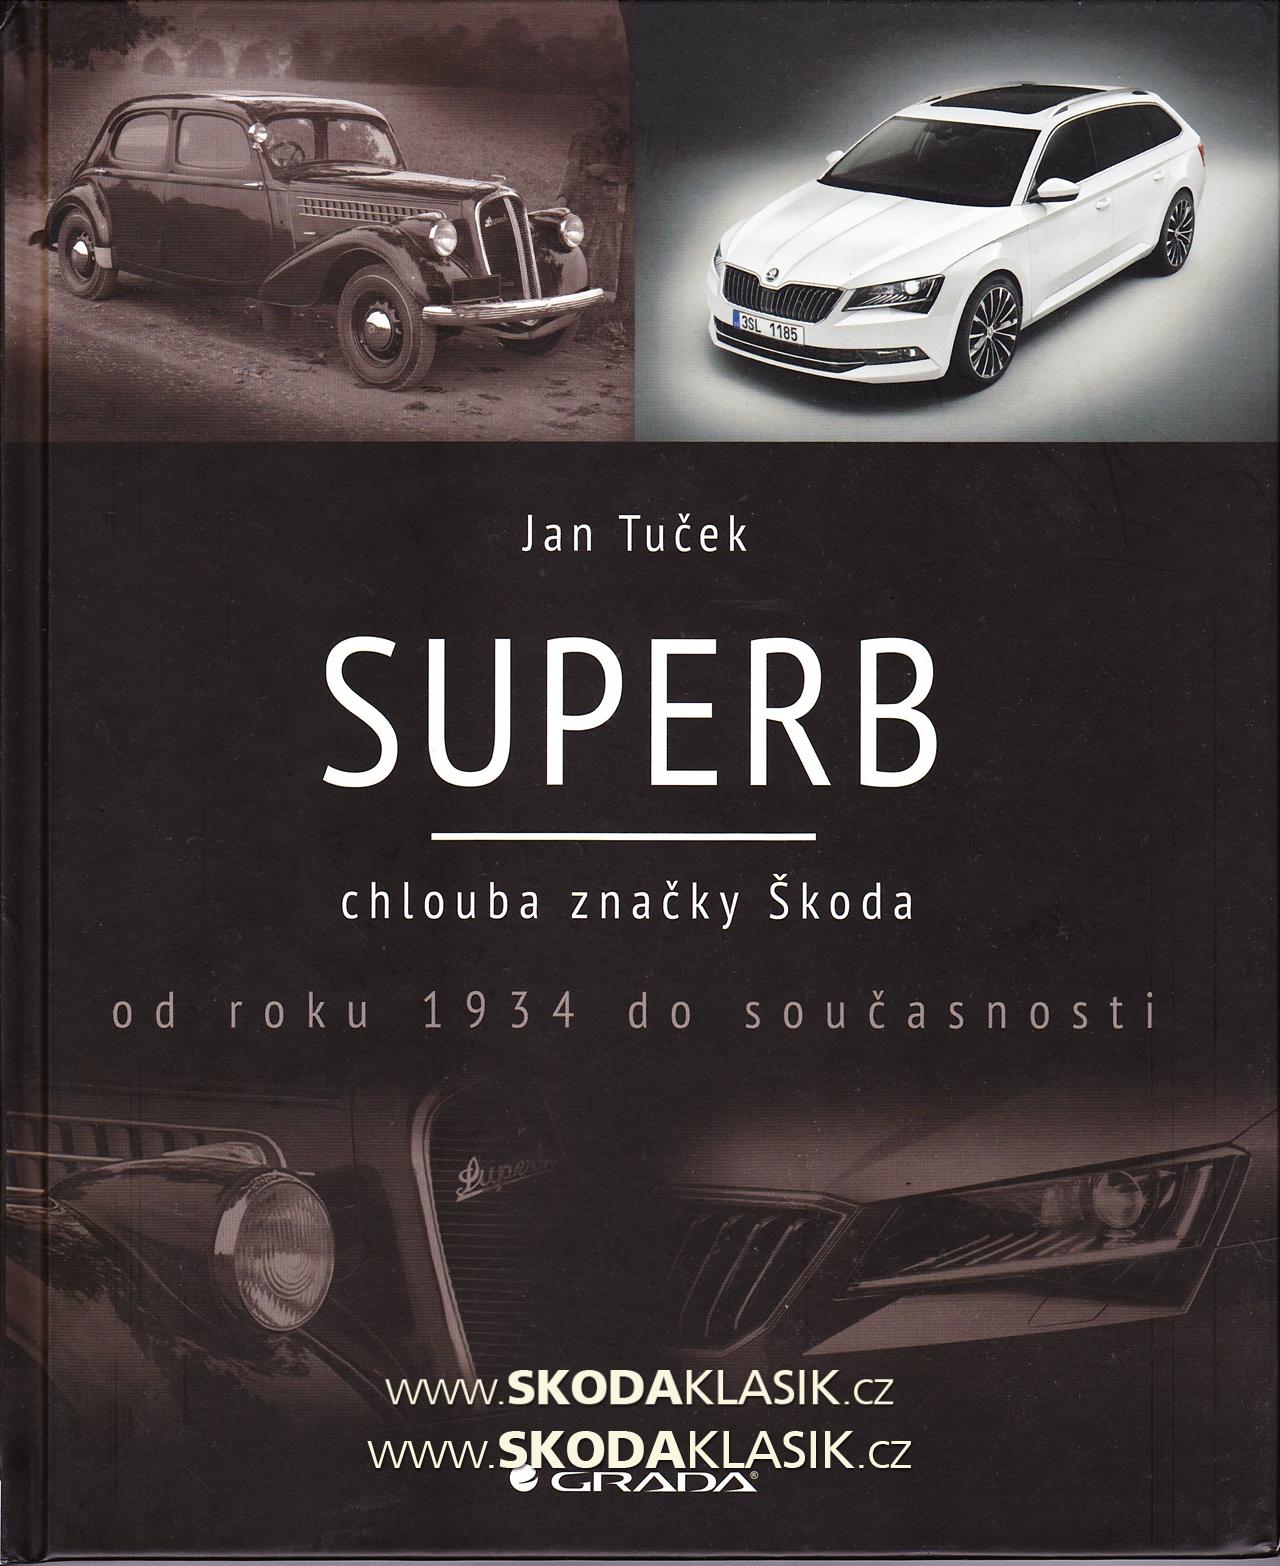 SUPERB-chlouba-znacky-skoda-02